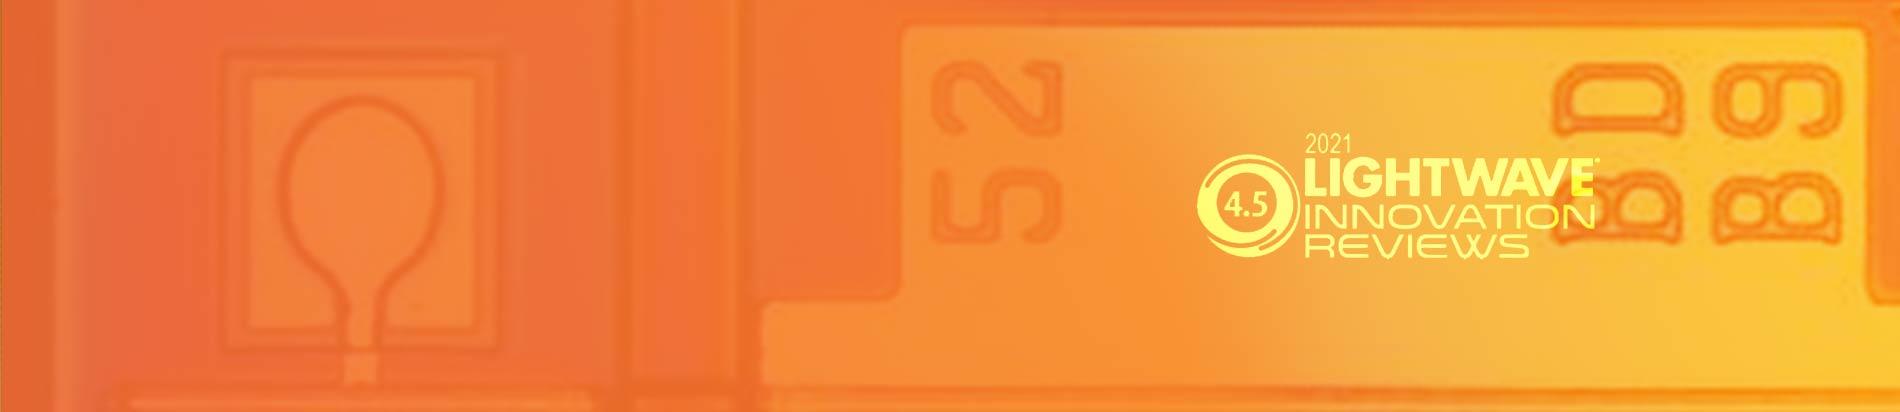 Lumentum 100G PAM4 Uncooled EMLs Honored in the Lightwave 2021 Innovation Reviews Program